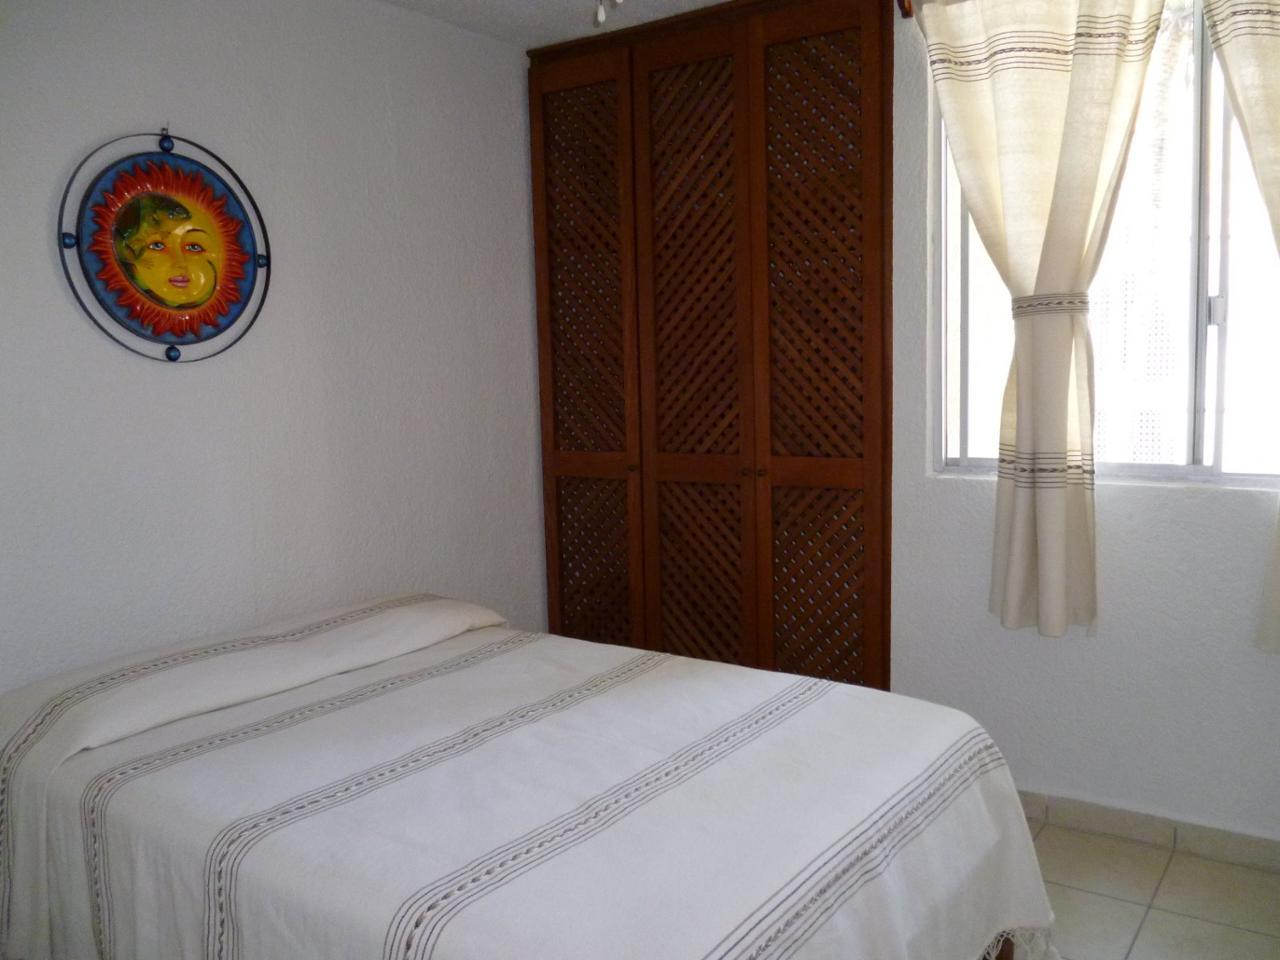 Departamento en Renta Carrizal, Bahias De Huatulco, Oaxaca